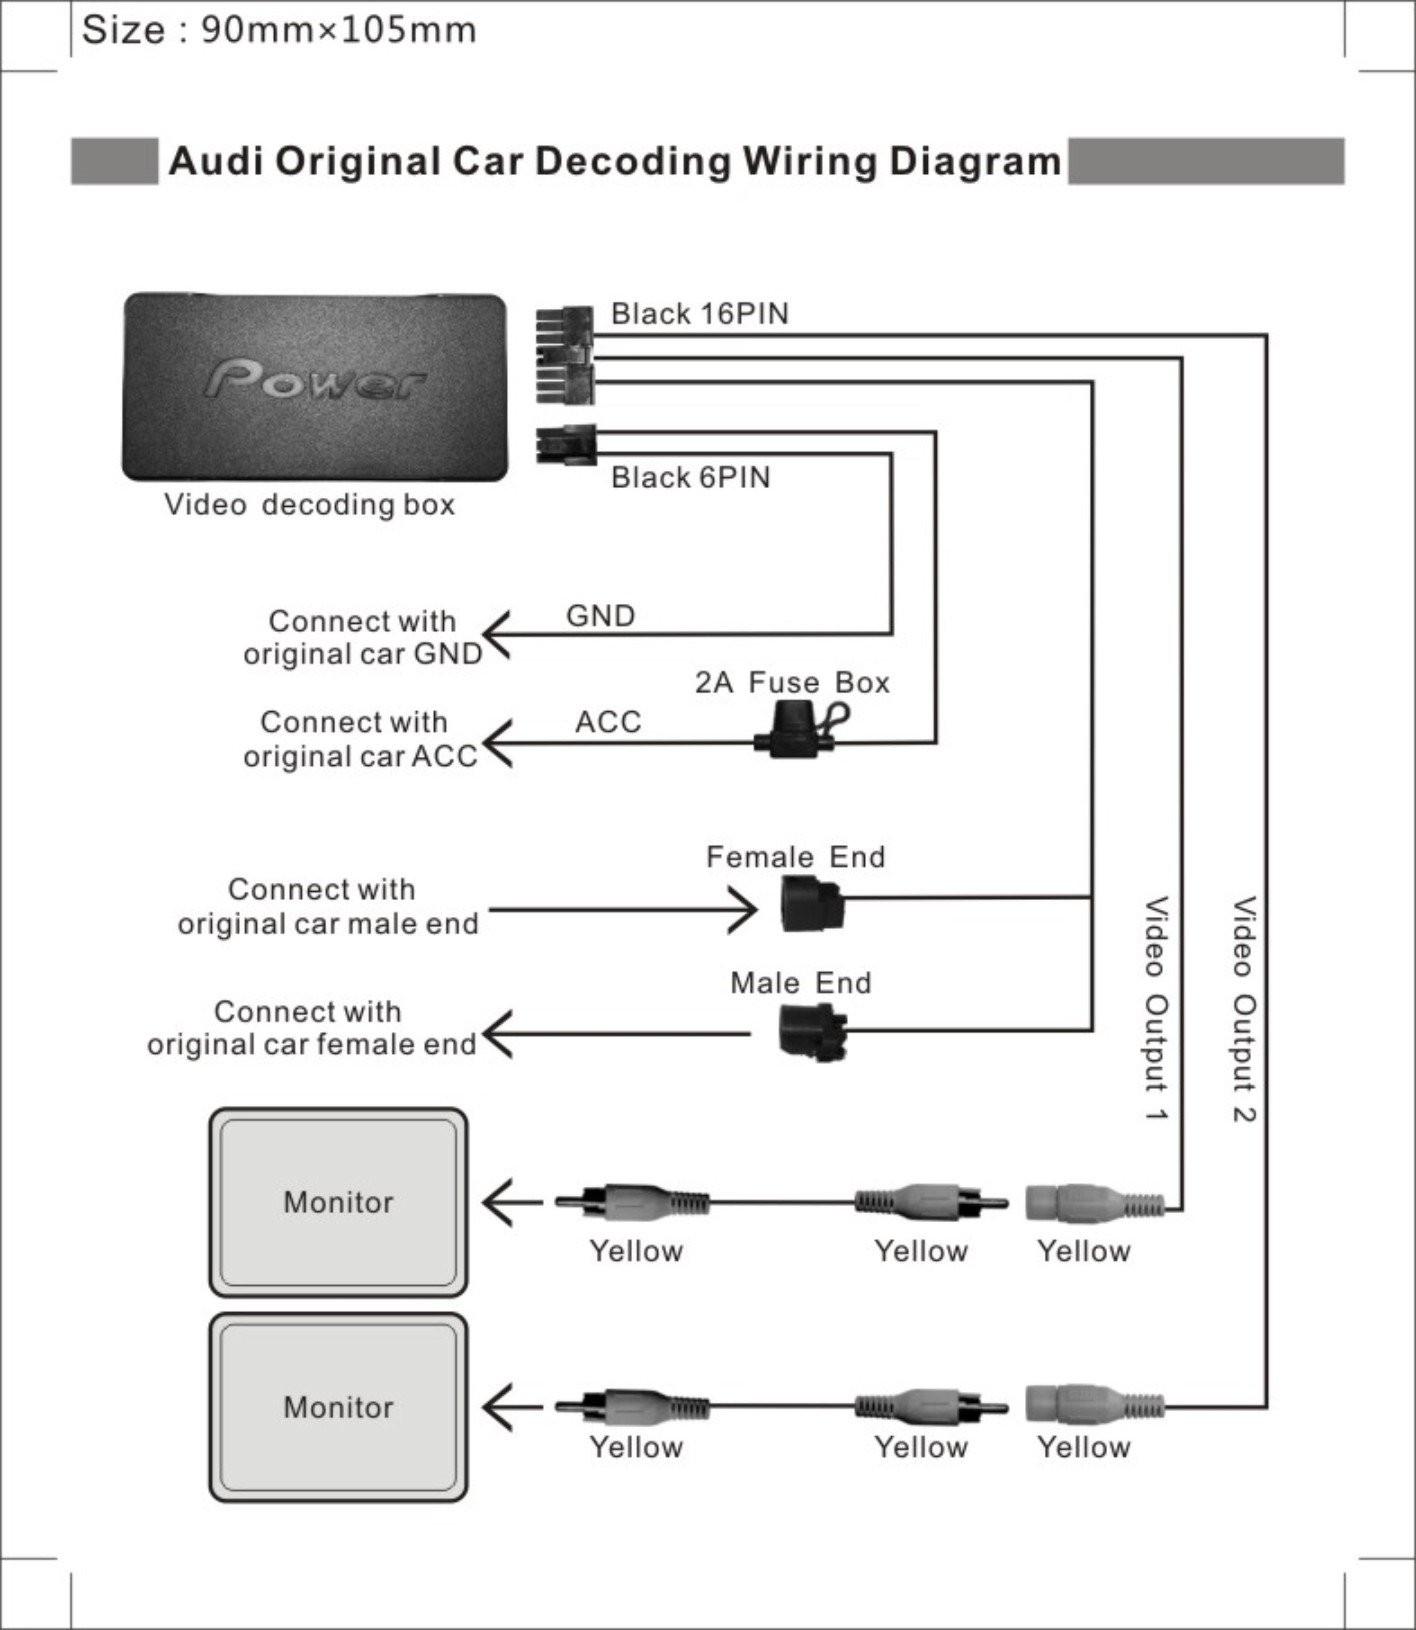 Clarion Vrx755vd Wiring Diagram Image 16 Pin New Headrest Dvd Diagrams Schematics Fresh